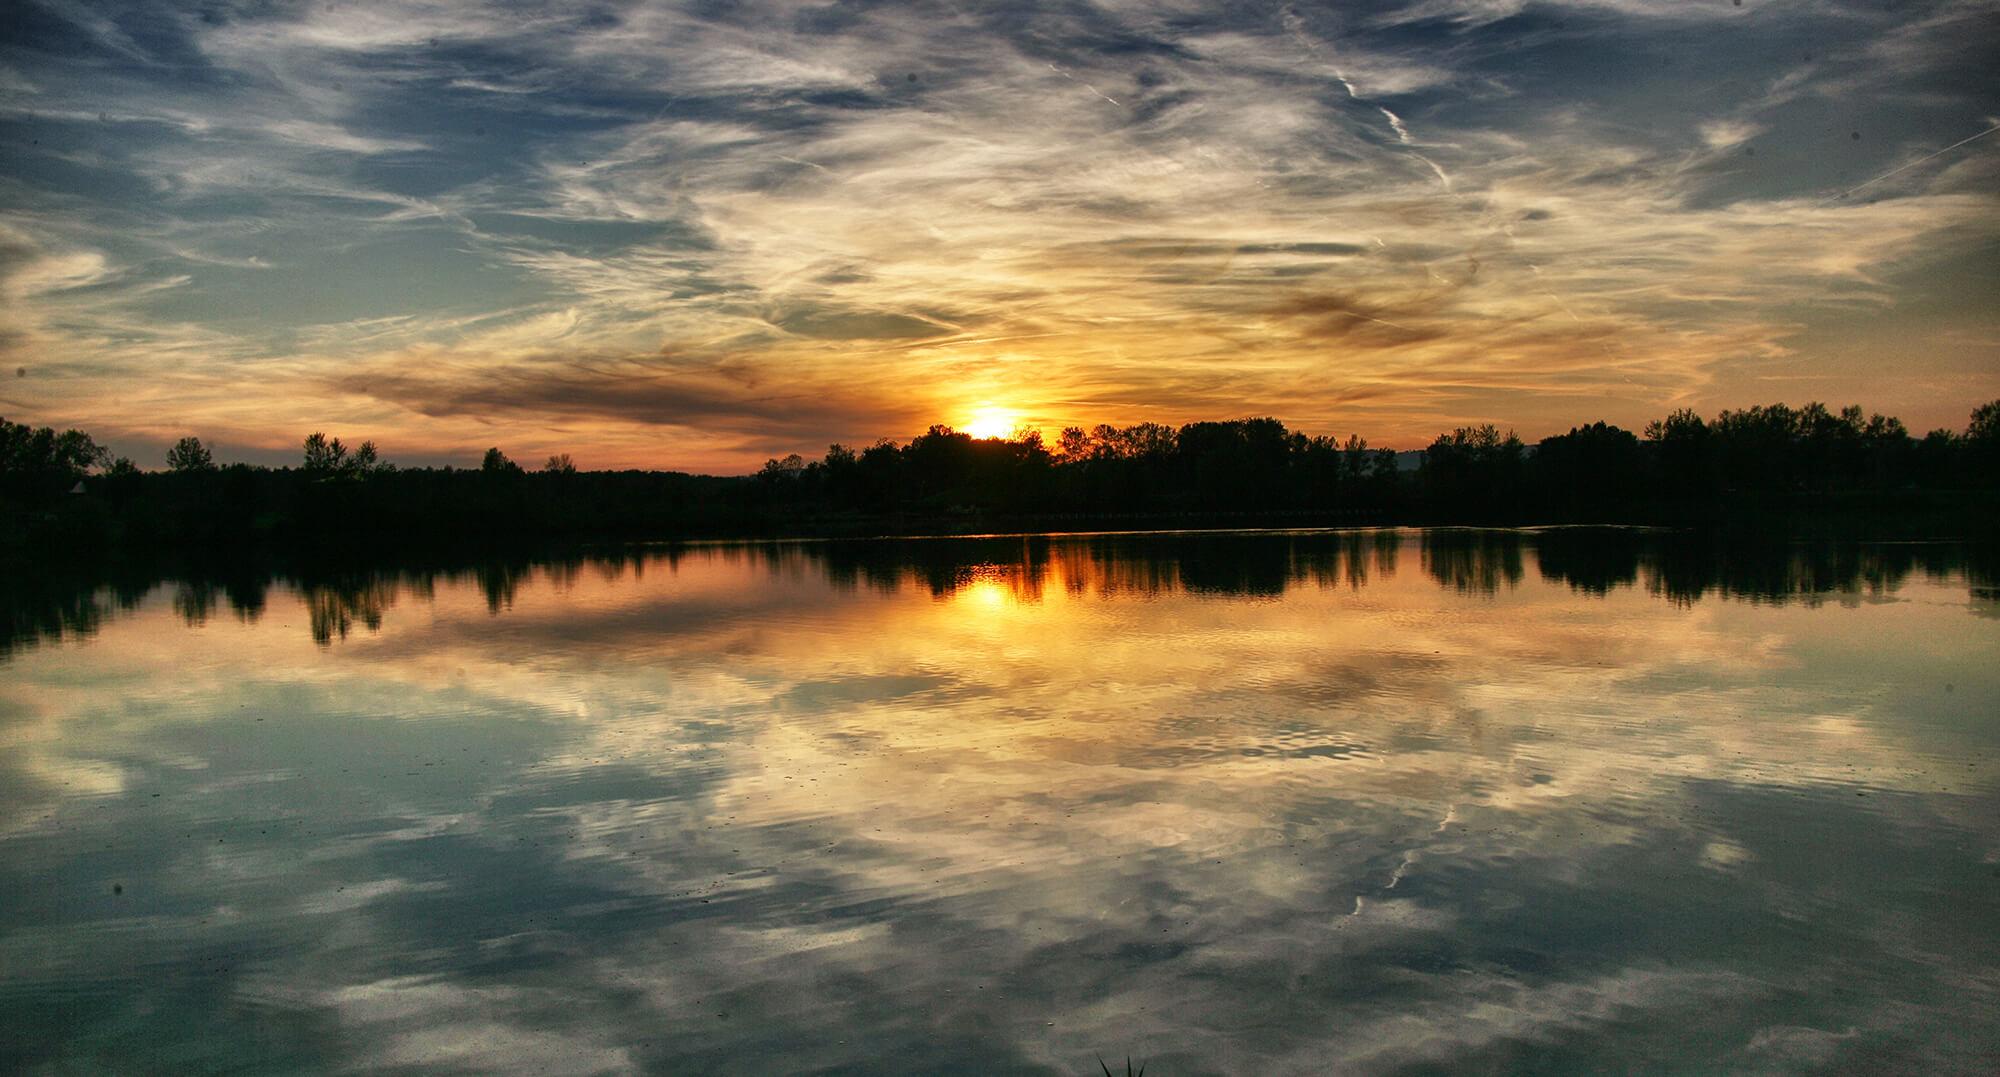 THALHAMMERs Sonnenuntergang Feldkirchner Badesee